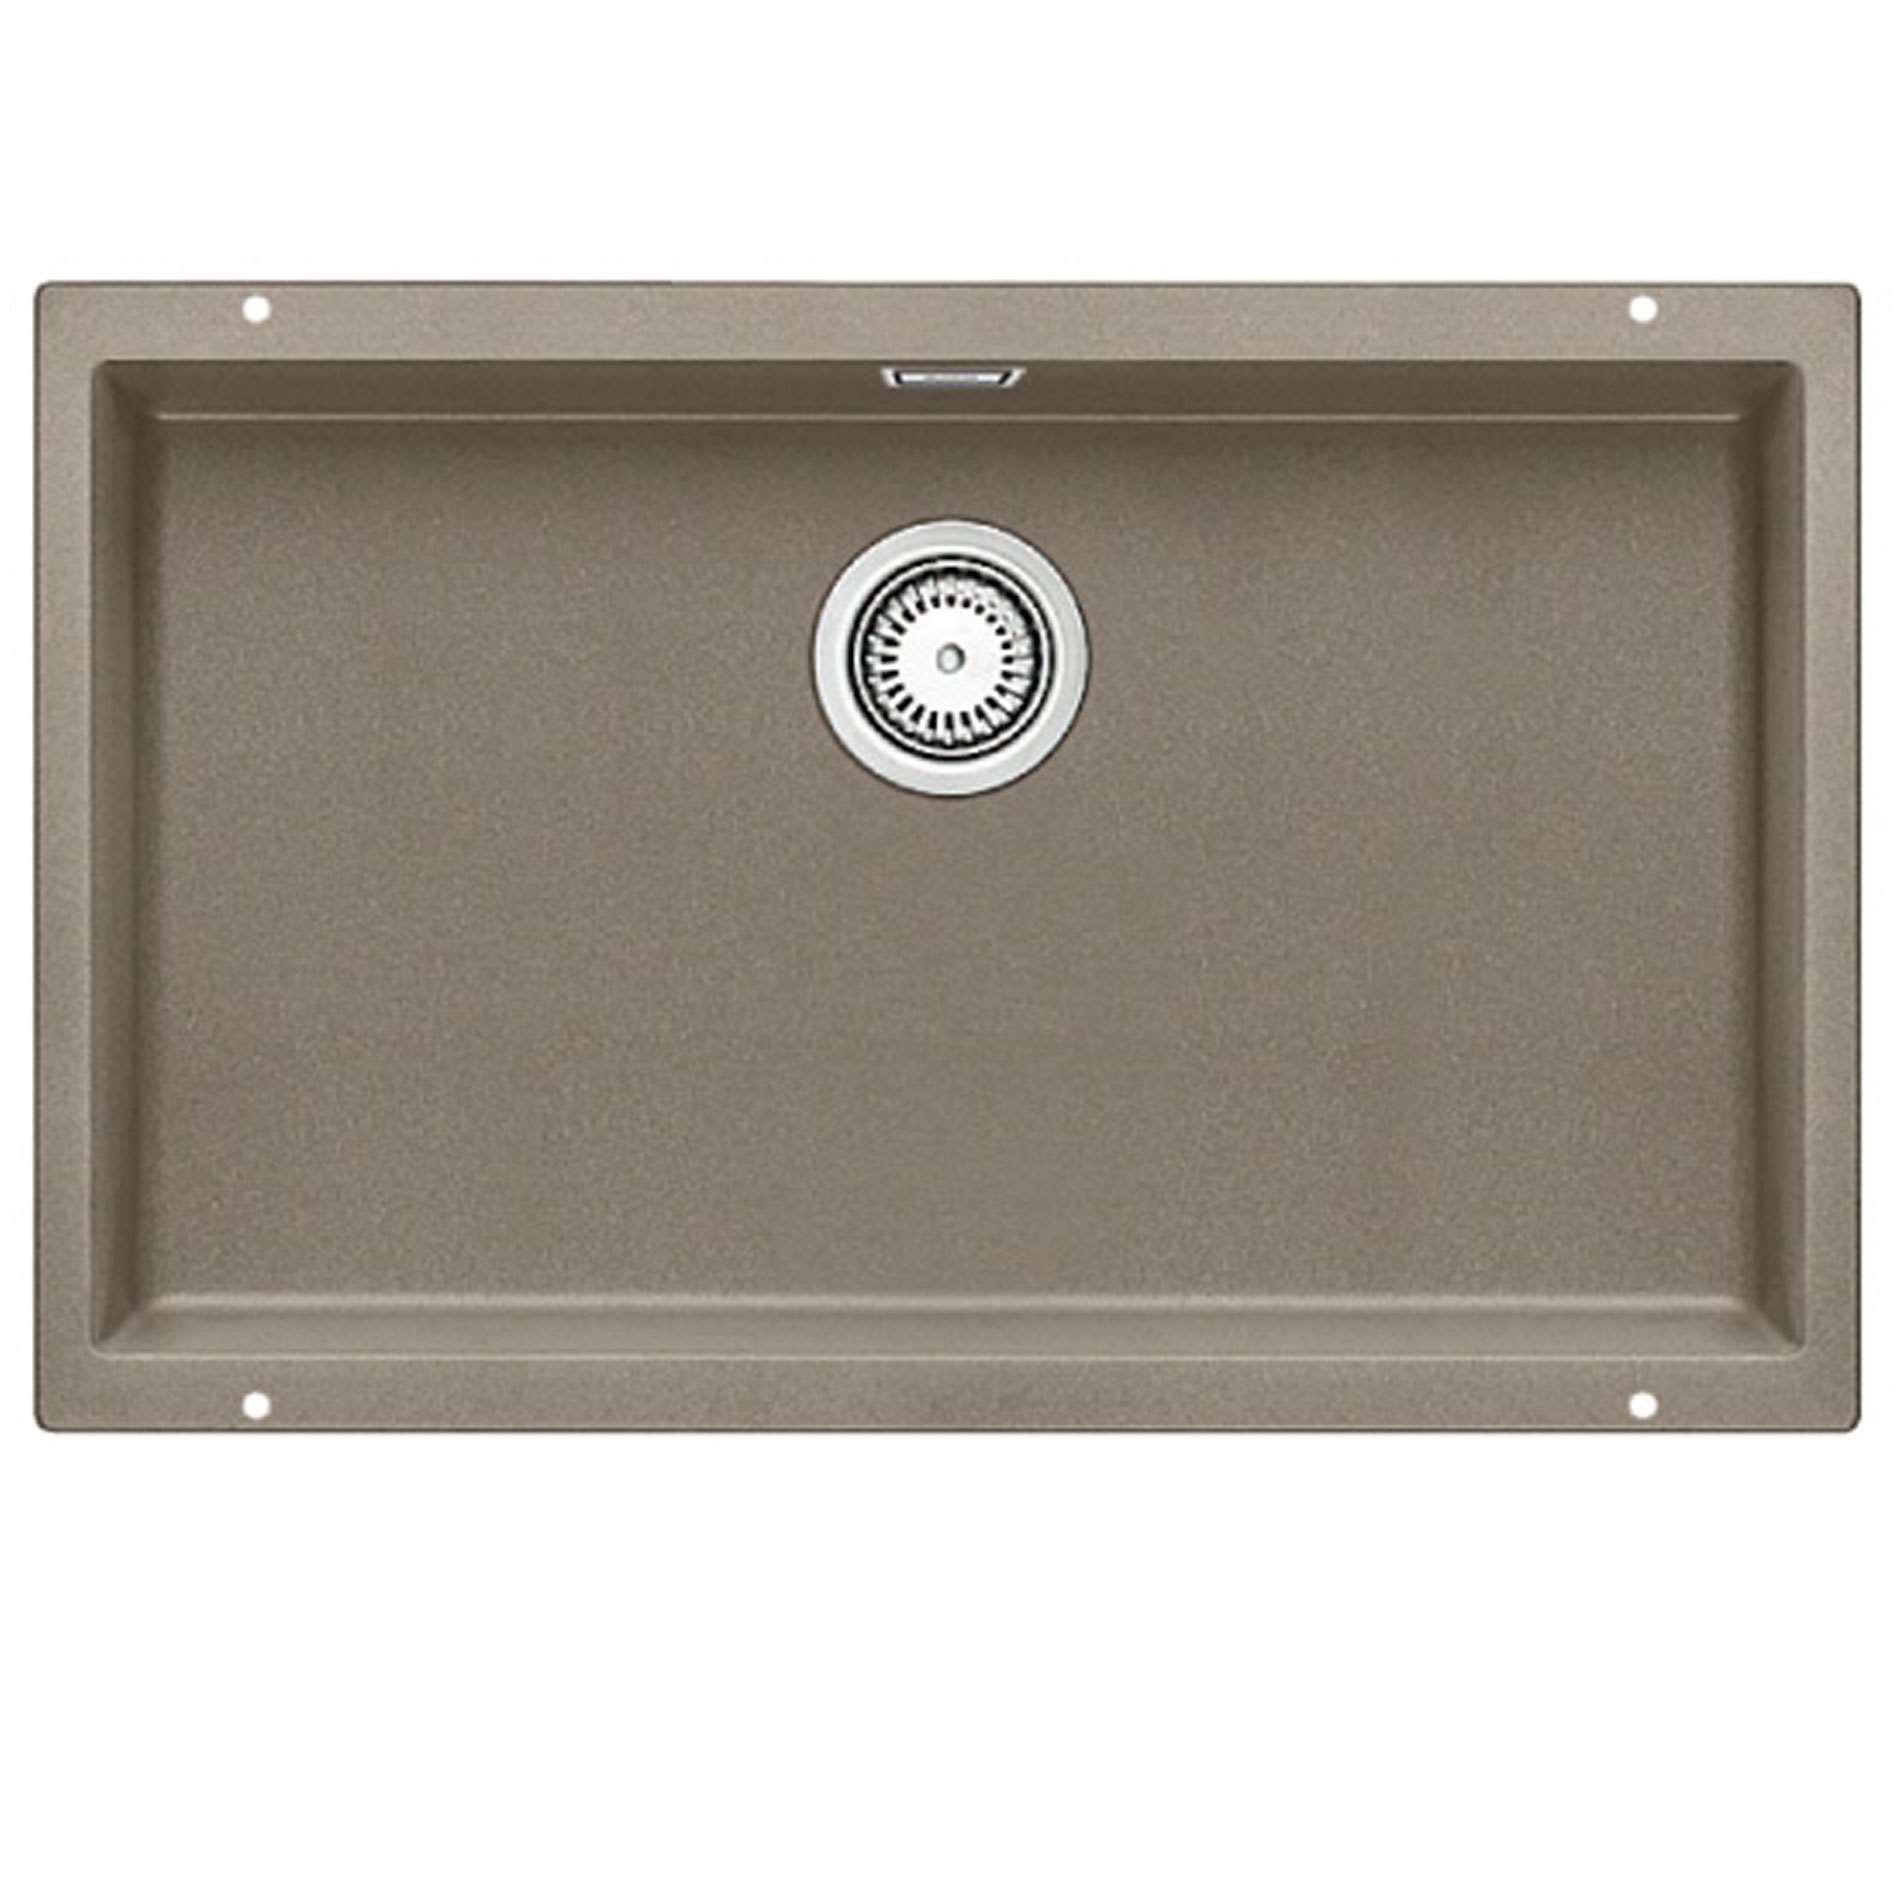 blanco subline 700 u tartufo silgranit sink kitchen. Black Bedroom Furniture Sets. Home Design Ideas